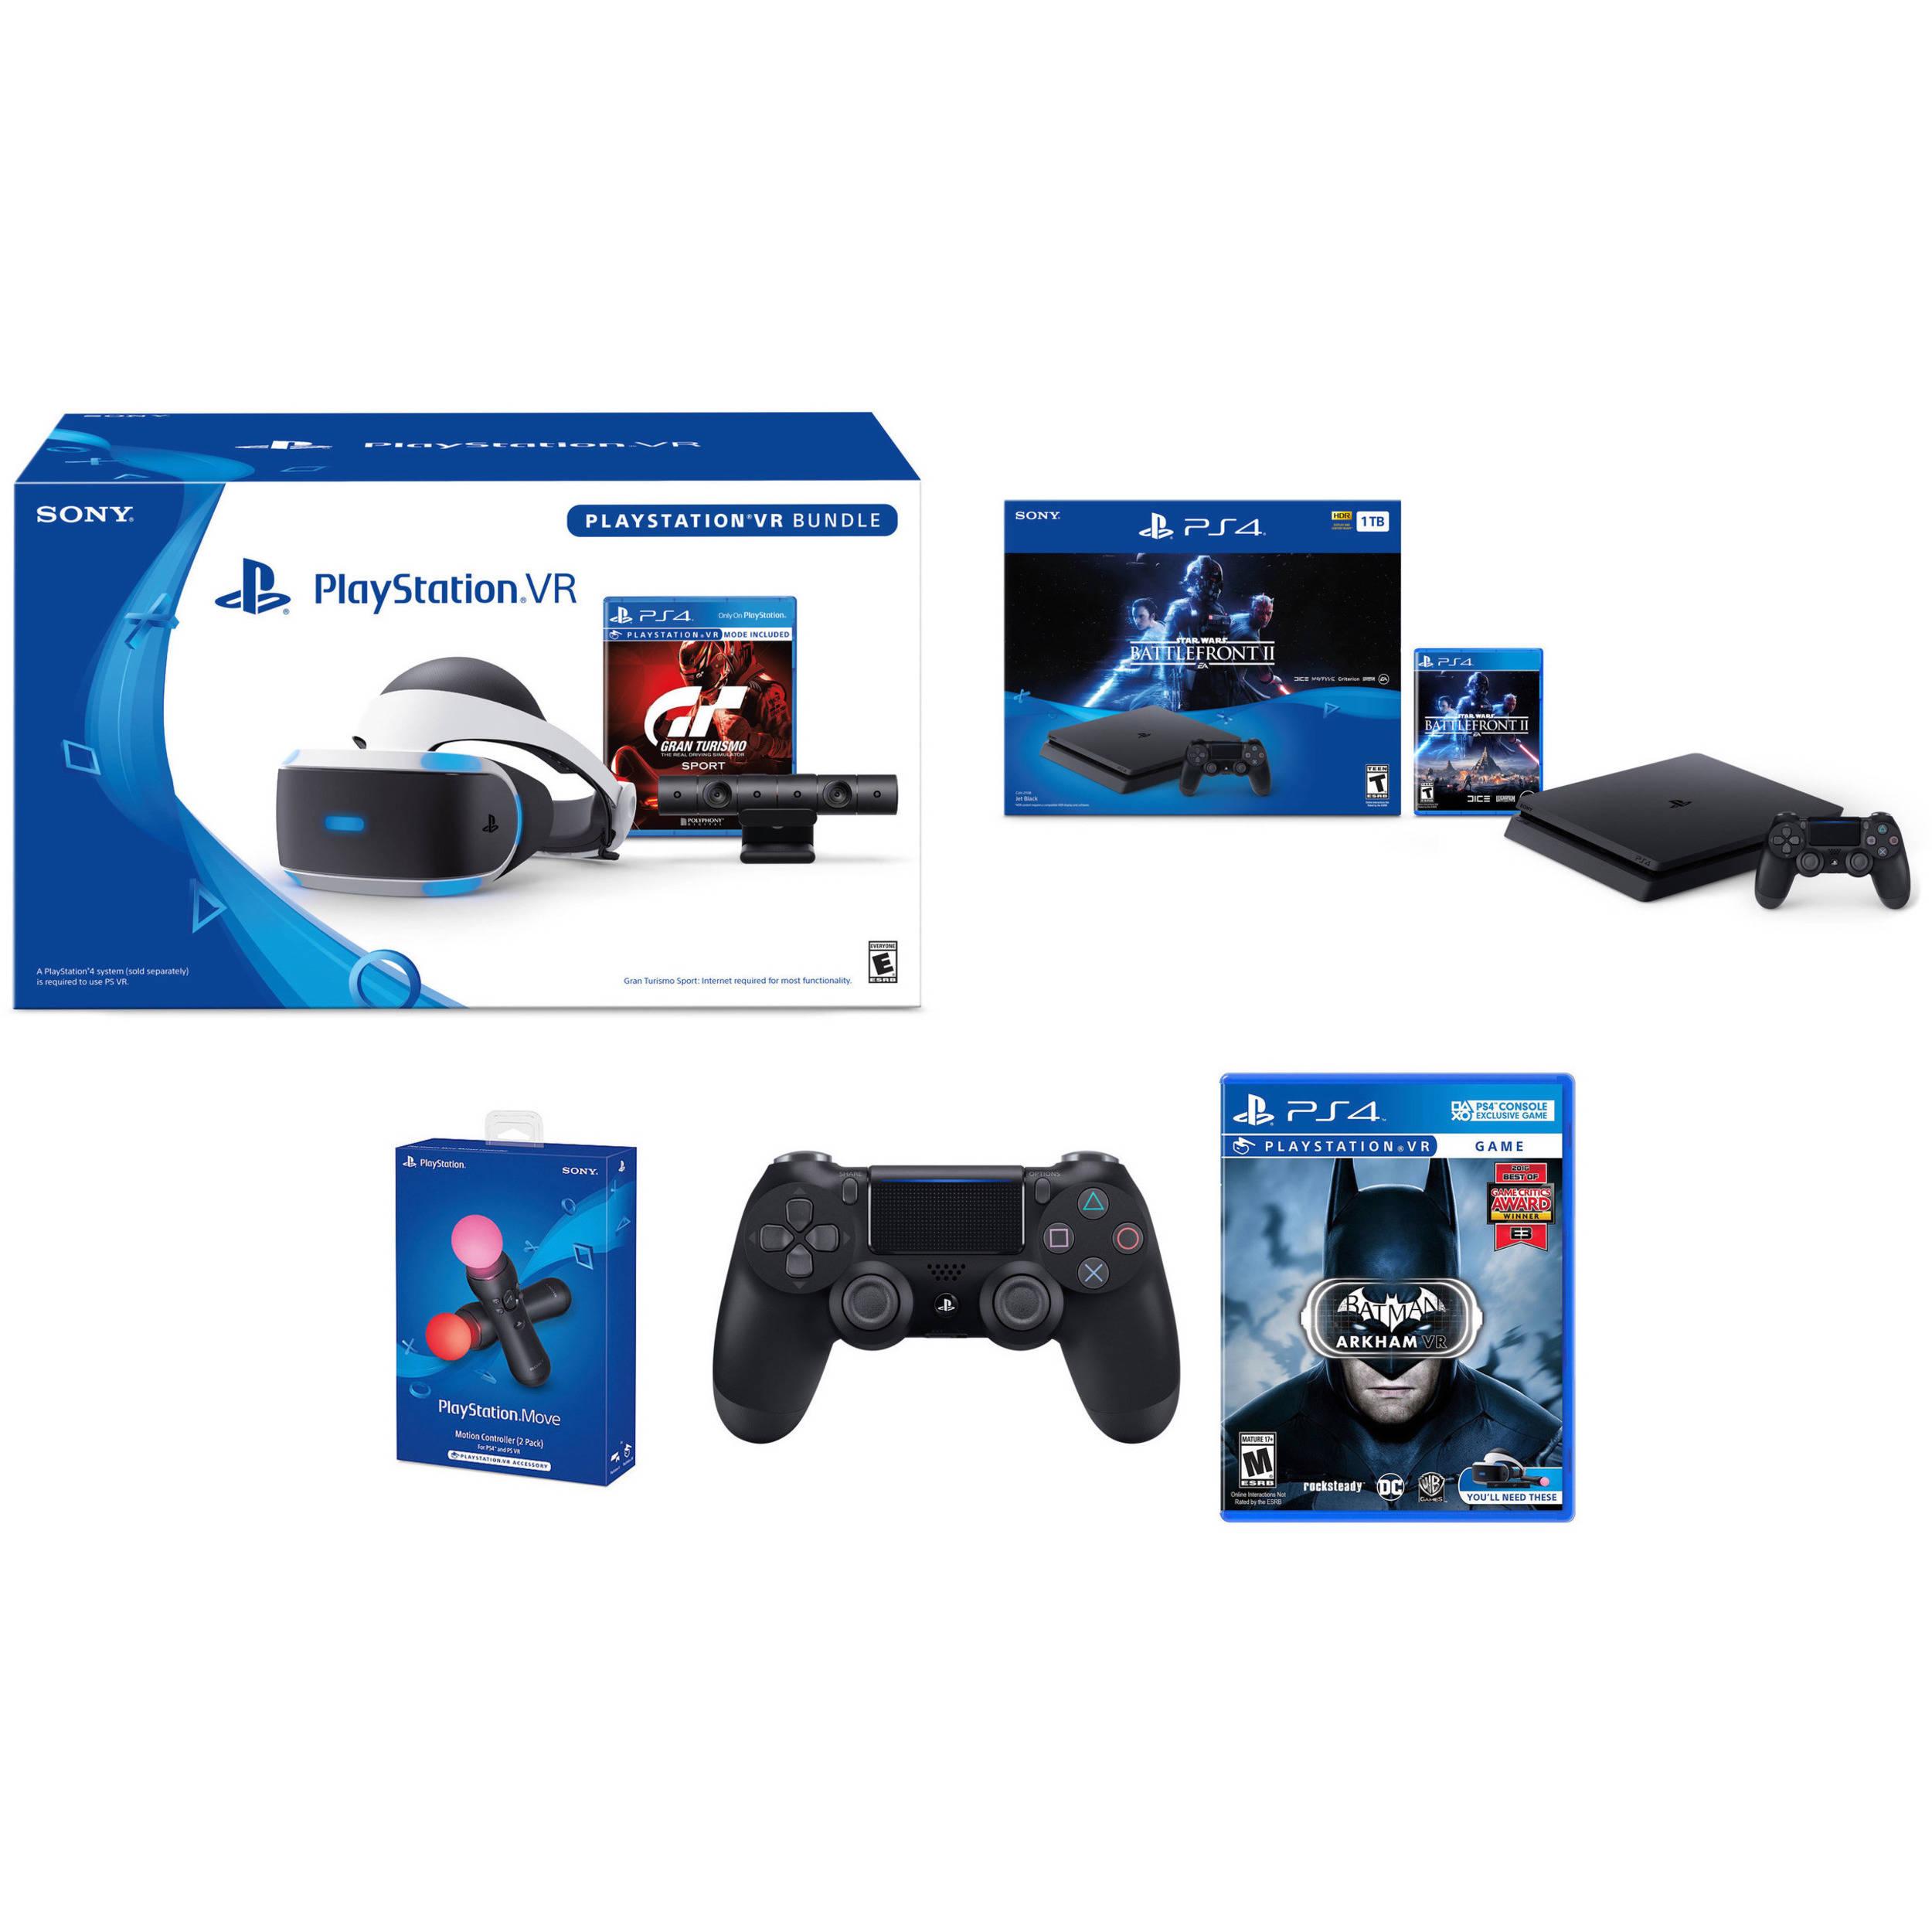 4acf73f50 Sony Star Wars Battlefront II PlayStation 4 Bundle Kit with PlayStation VR  Gran Turismo Sport Bundle